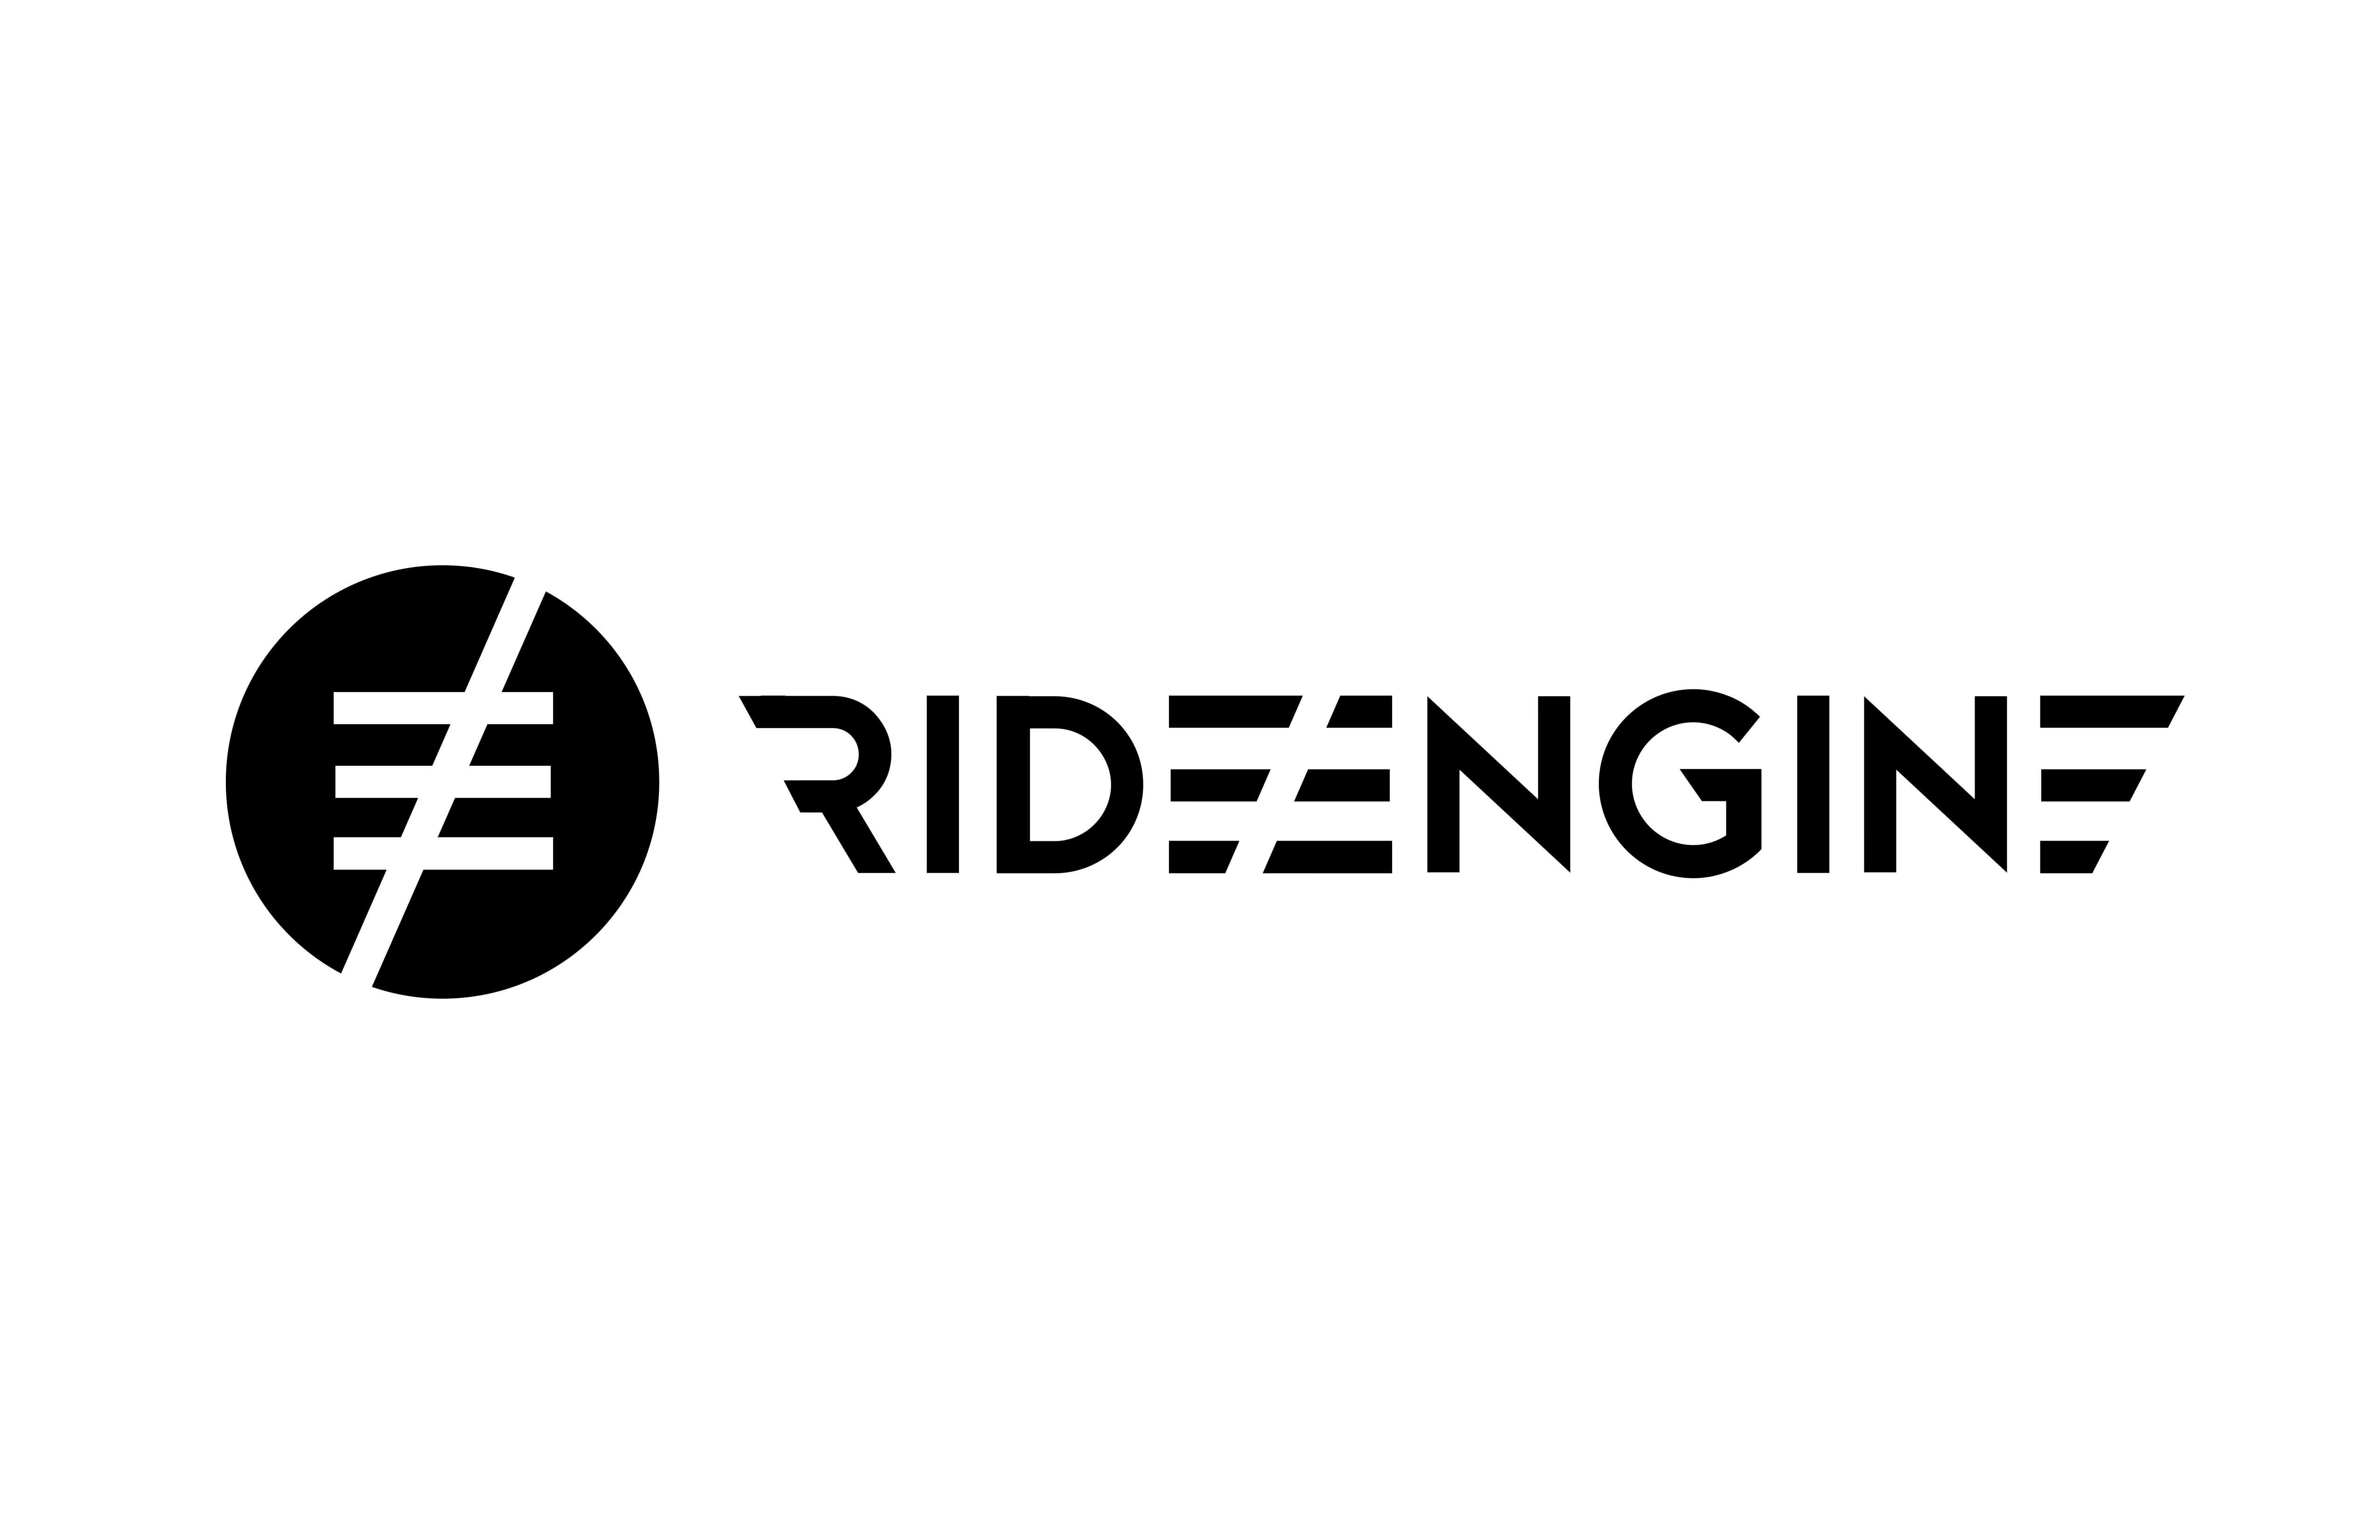 RIDE-ENGINE-LOGO-WORDMARK-BLACK9fZzrhLKcFKeq